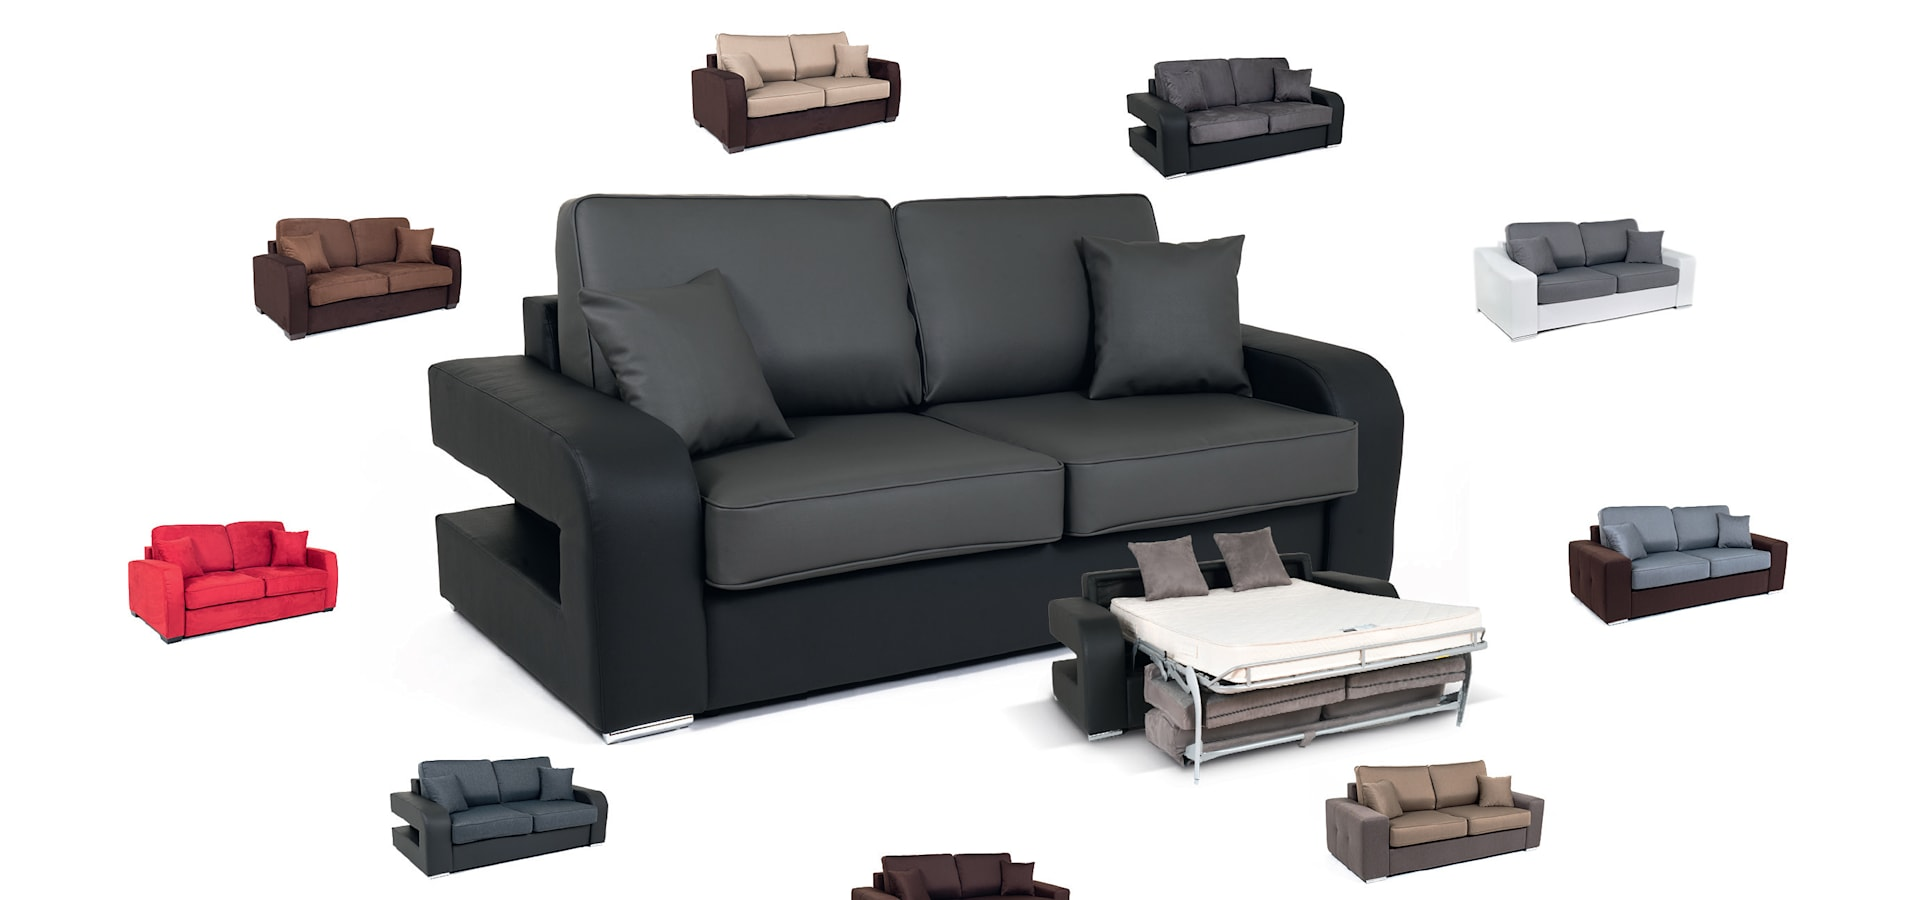 basika la solution meuble por basika homify. Black Bedroom Furniture Sets. Home Design Ideas